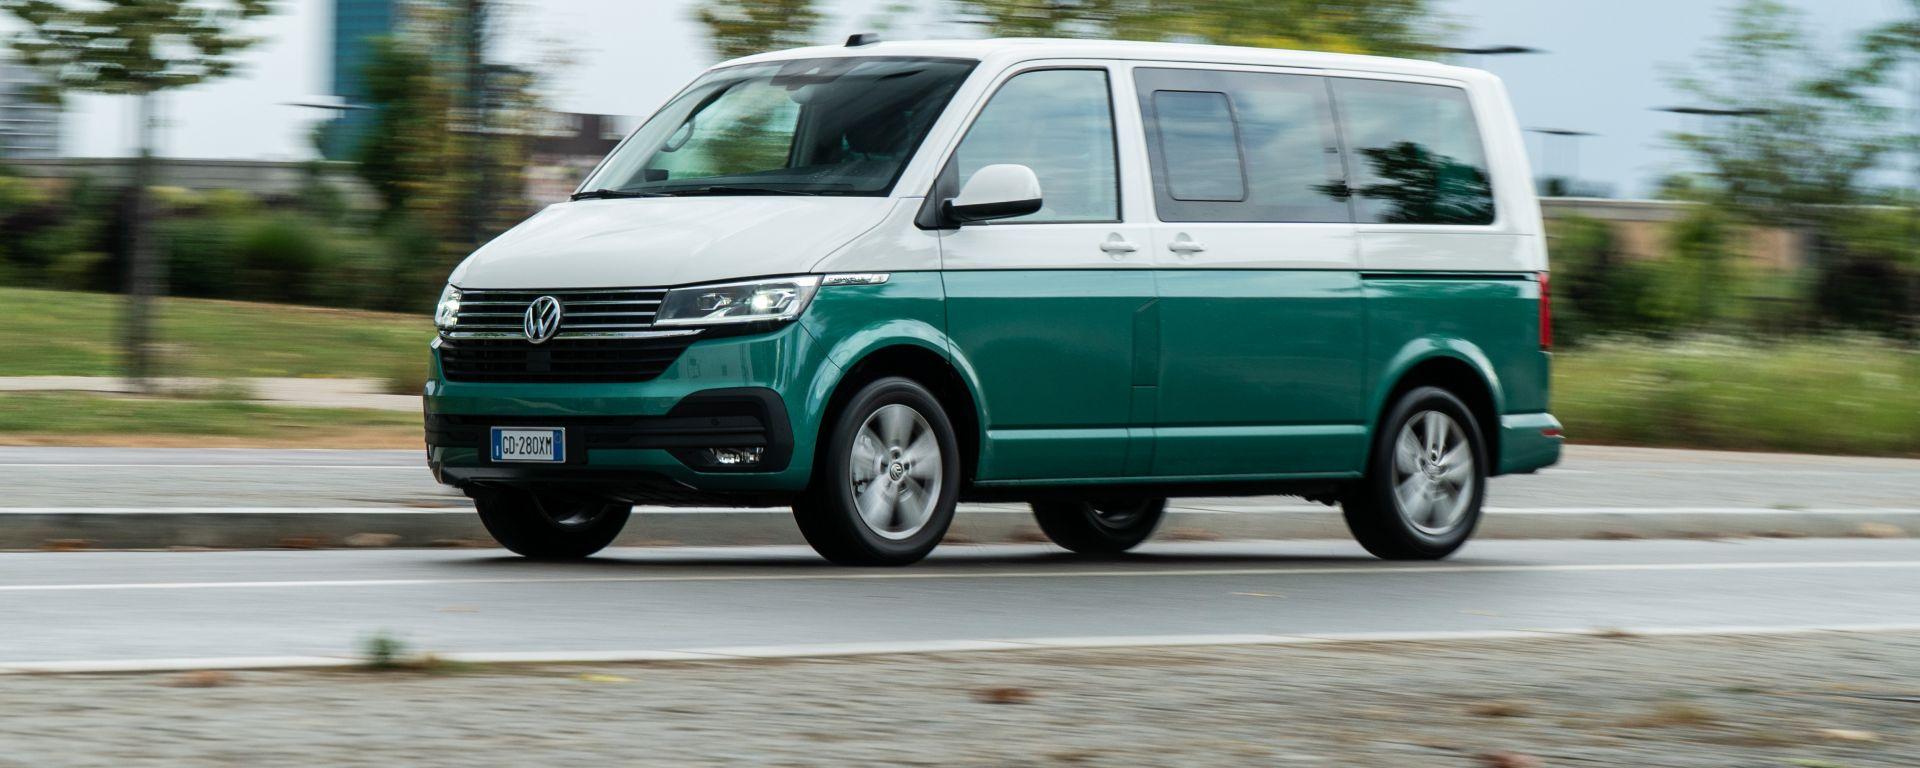 Volkswagen Caravelle, un momento del test drive